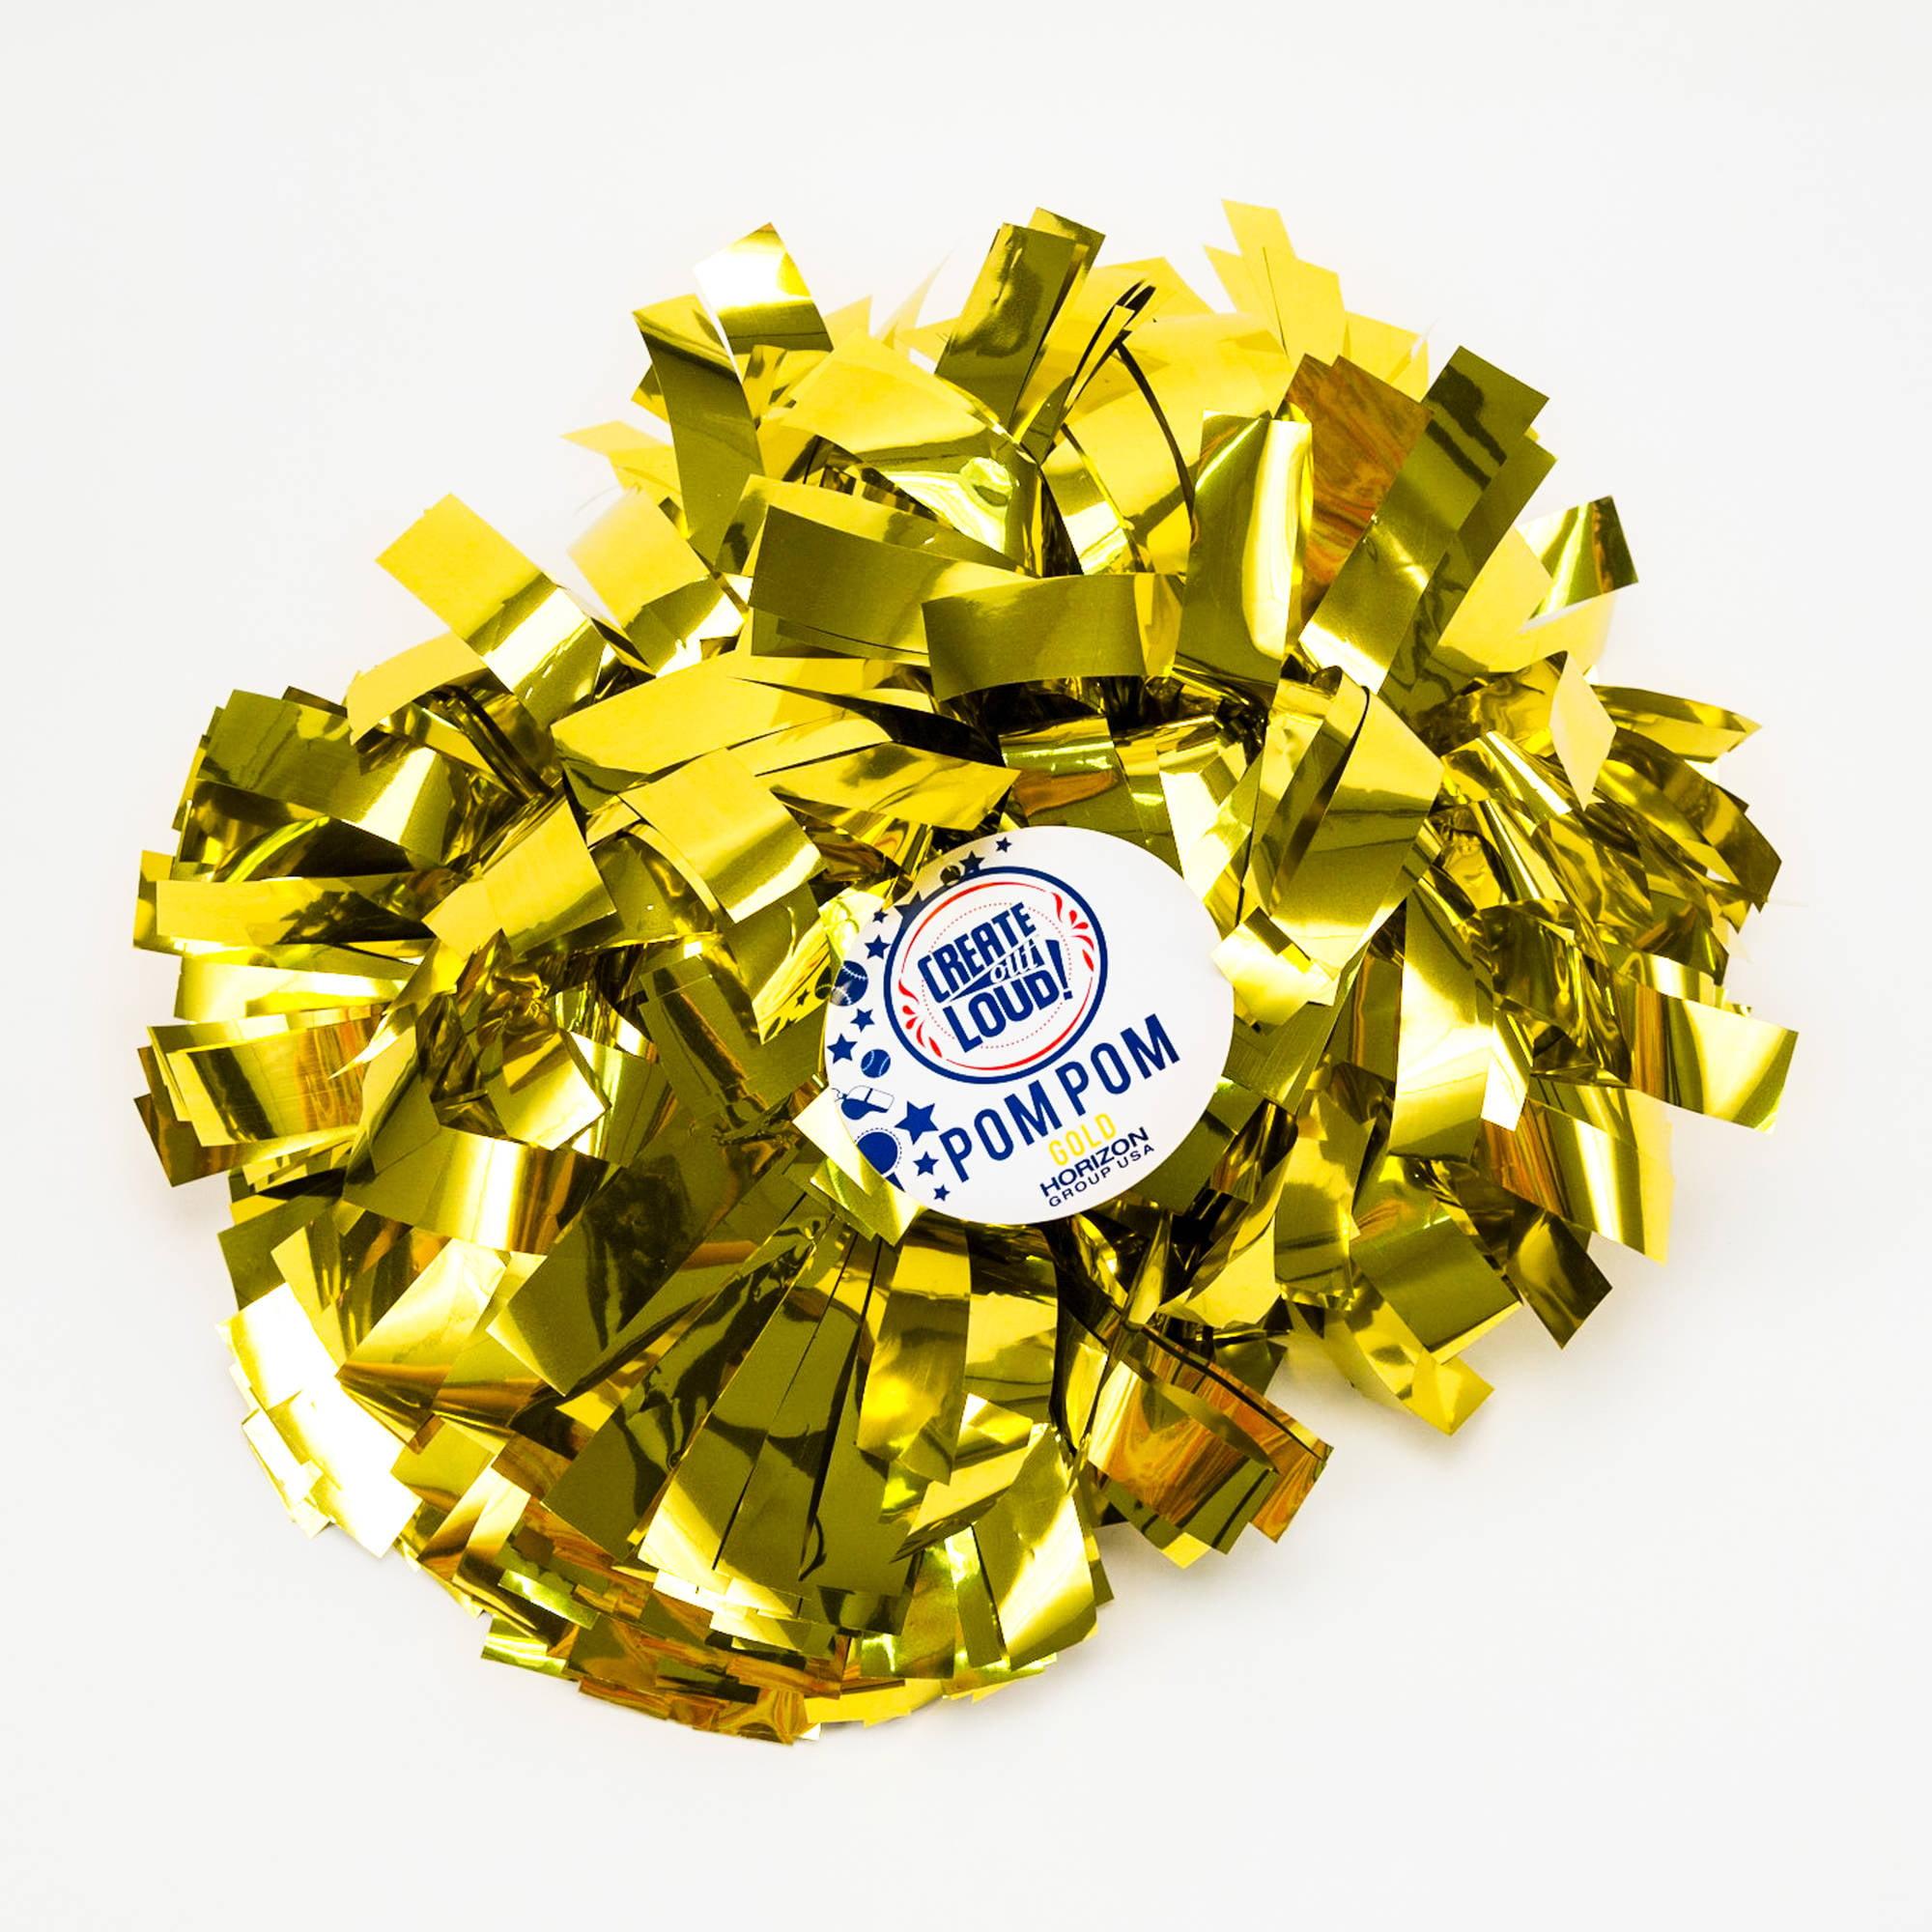 Create Out Loud Gold Pom Pom by Horizon Group USA - Walmart.com